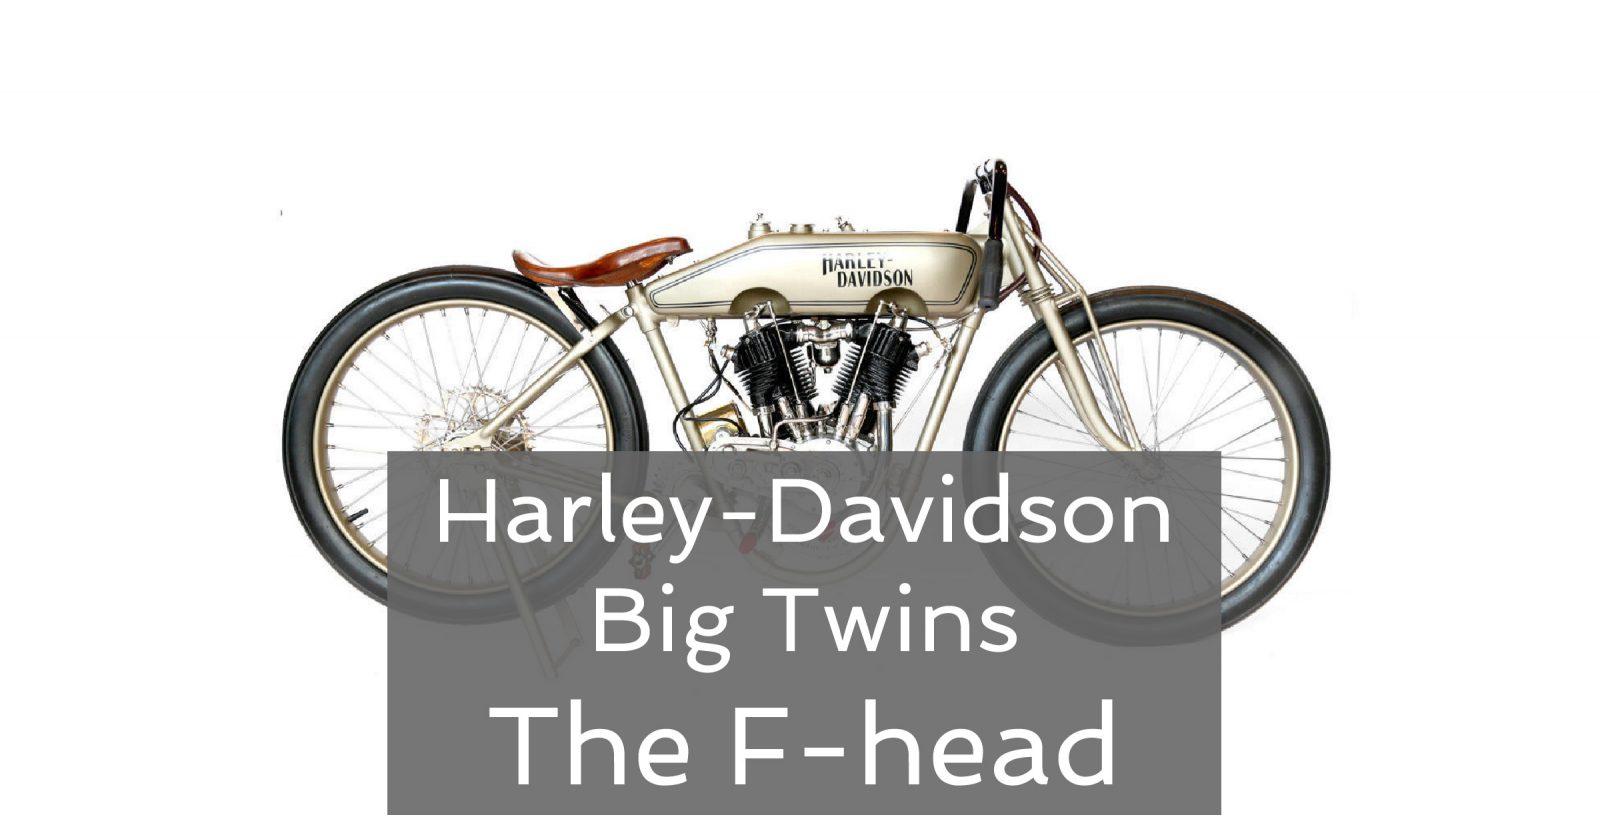 Harley F head 1600x837 - Harley-Davidson Big Twins – The F-head